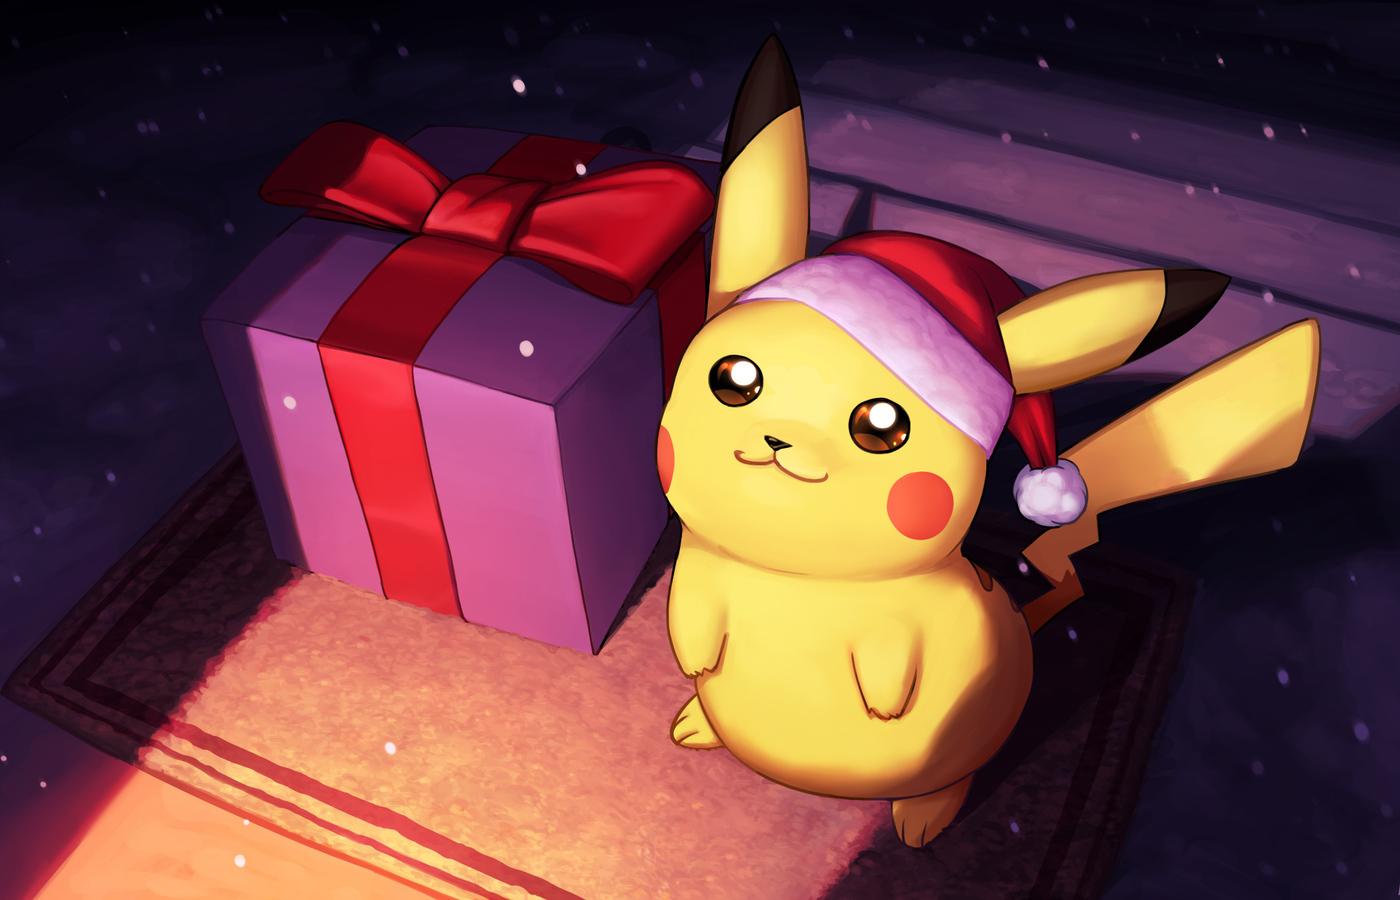 pikachu-on-christmas-day-fanart-da.jpg